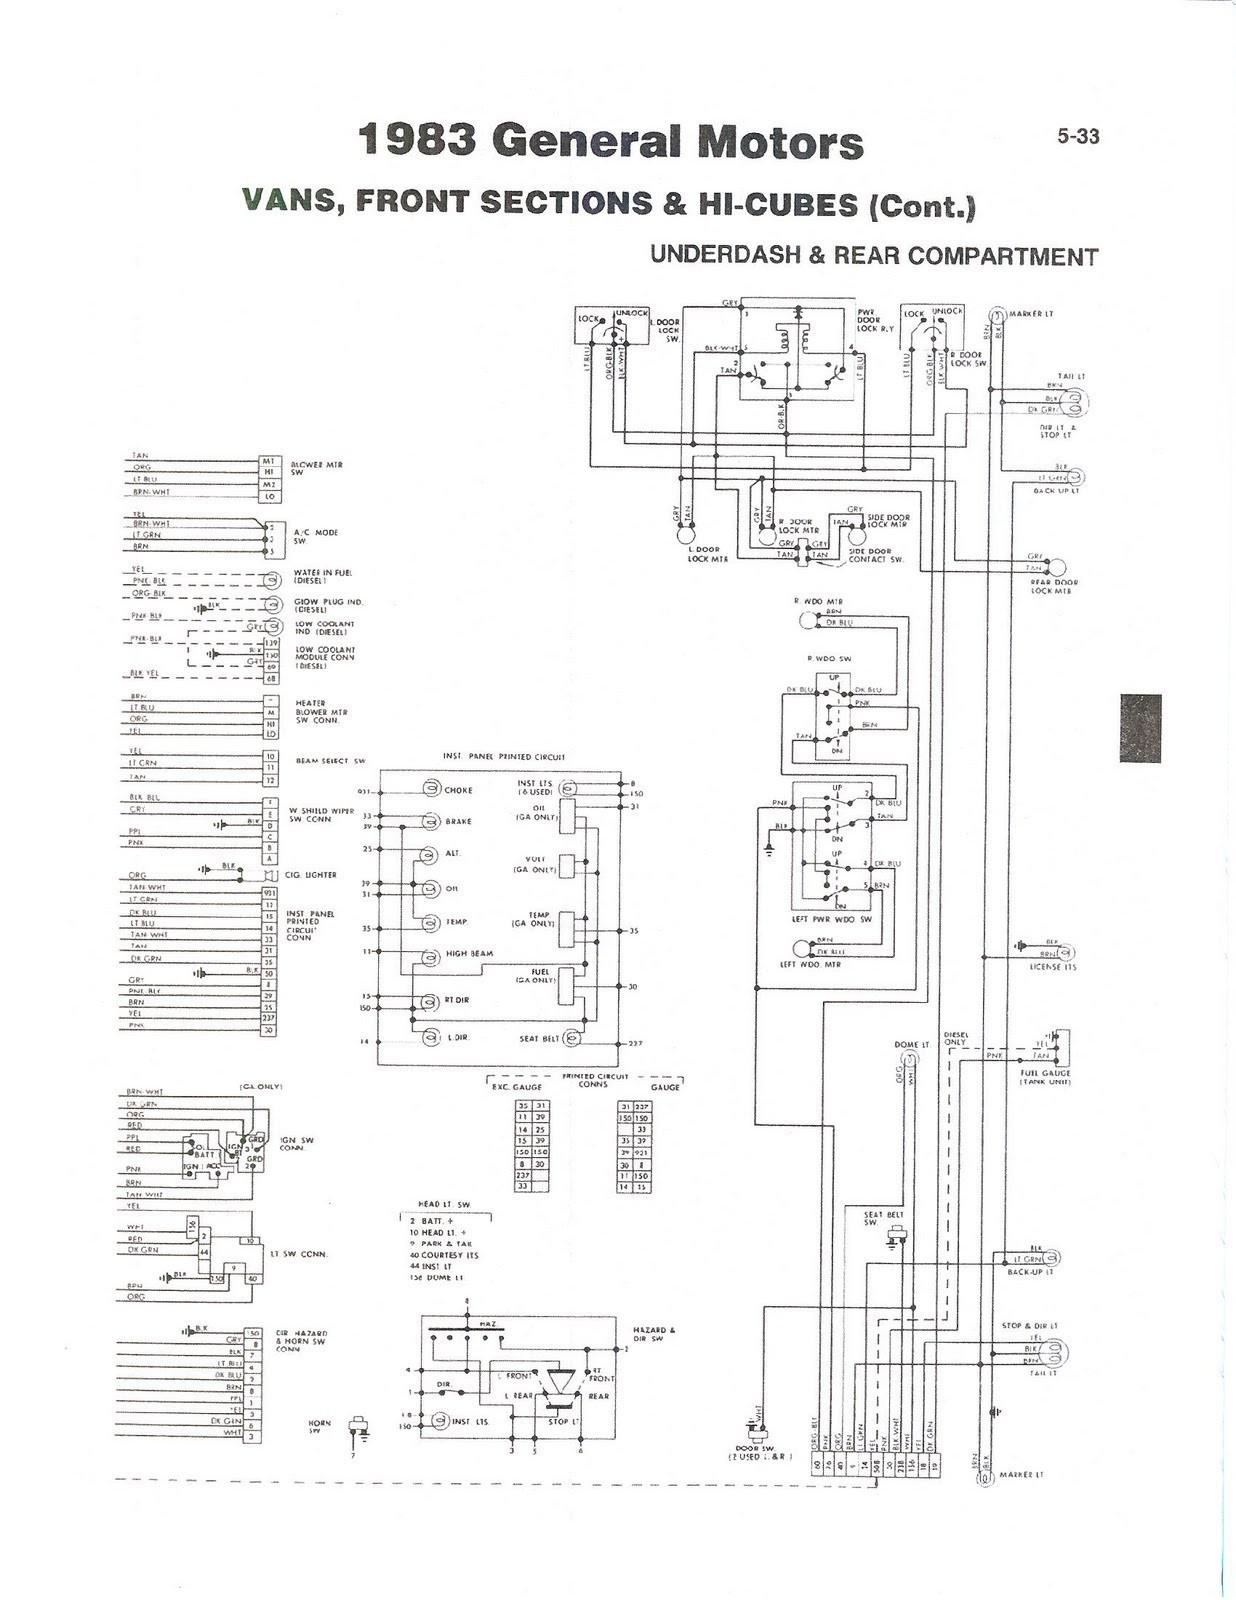 Wg 2591 2000 F53 Wiring Diagram Free Diagram